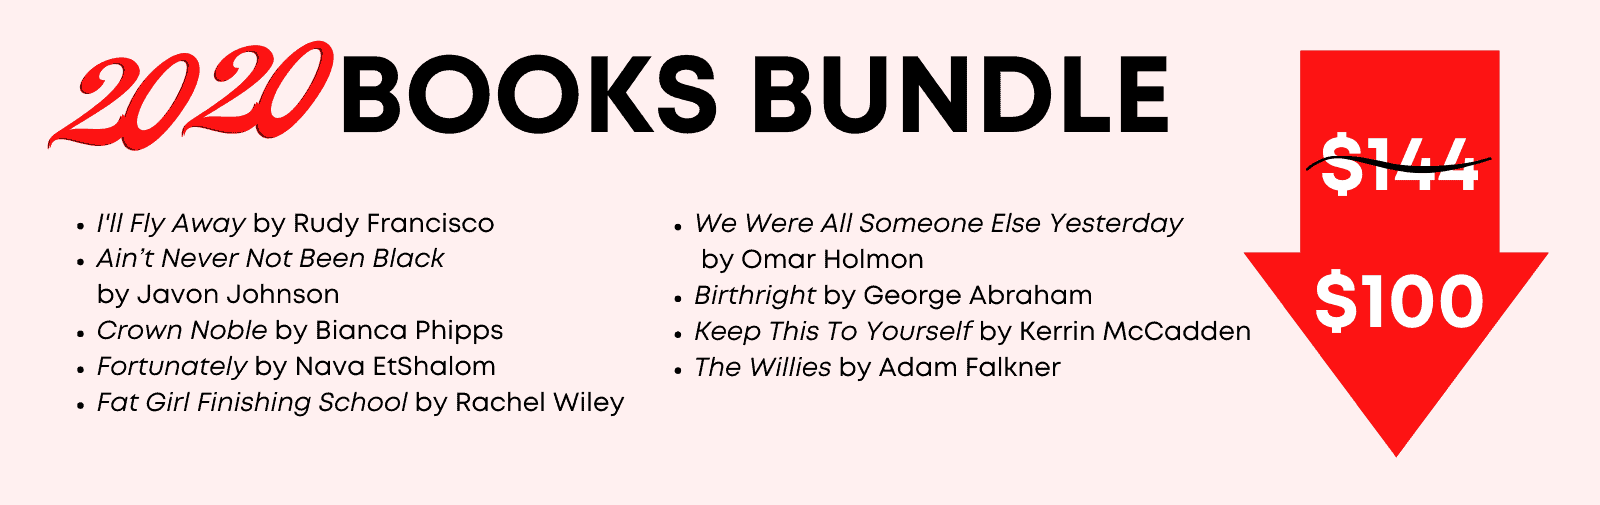 2020 Books Bundle